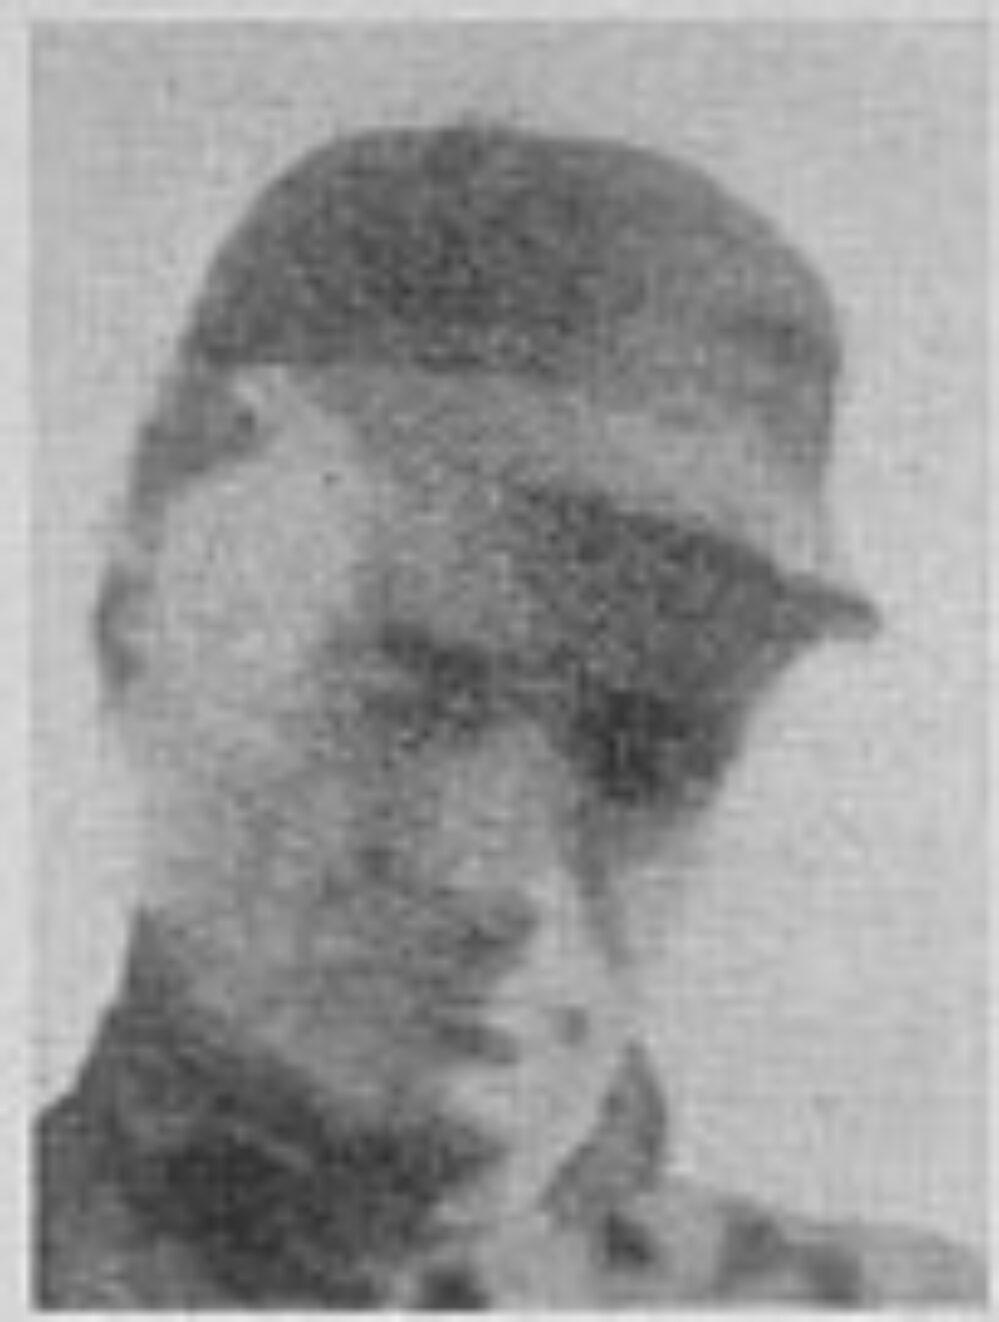 Johan Martinius Olsen Imøy